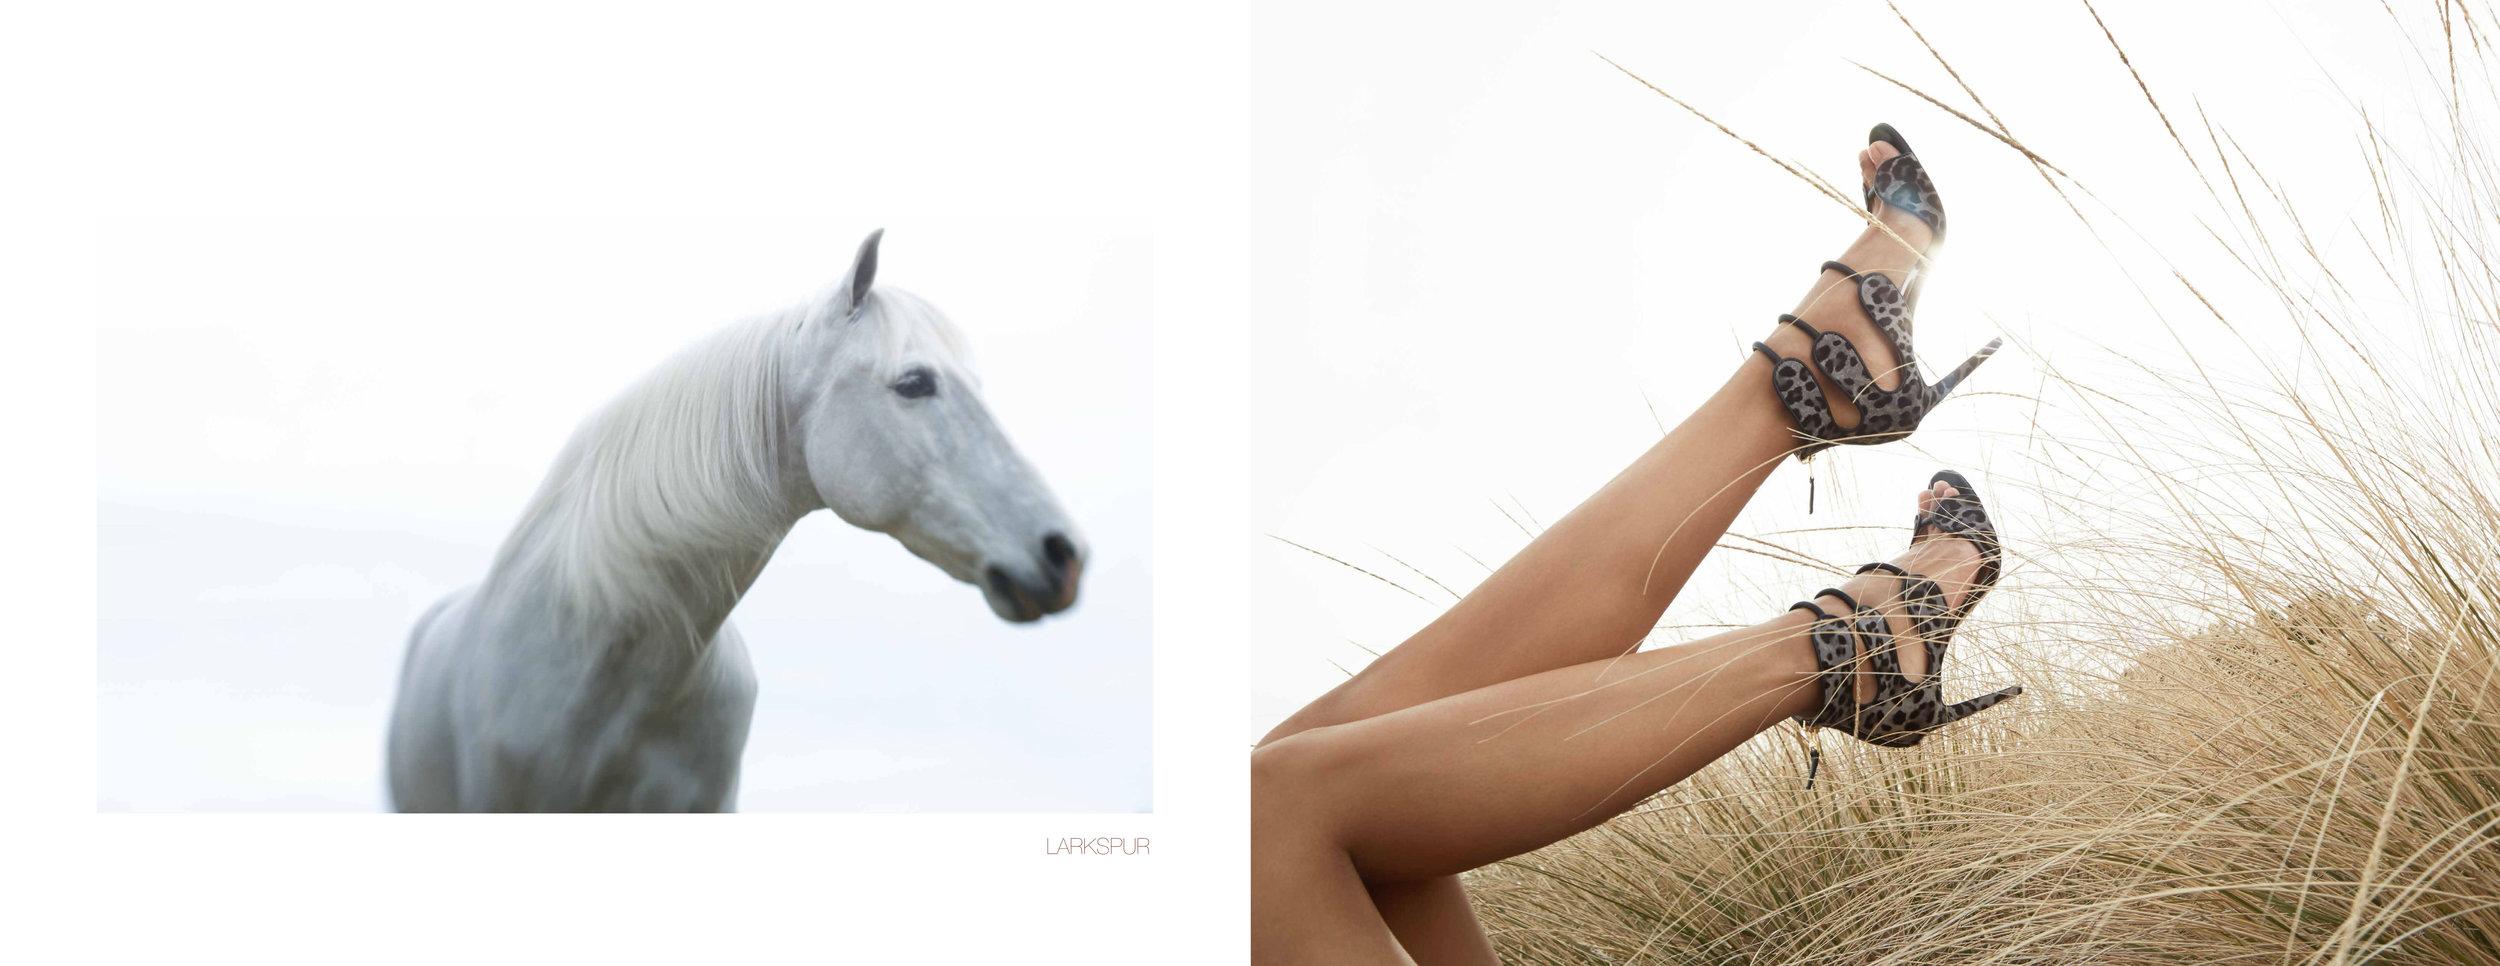 ChloeGosselin-FW17-lookbook1-8.jpg